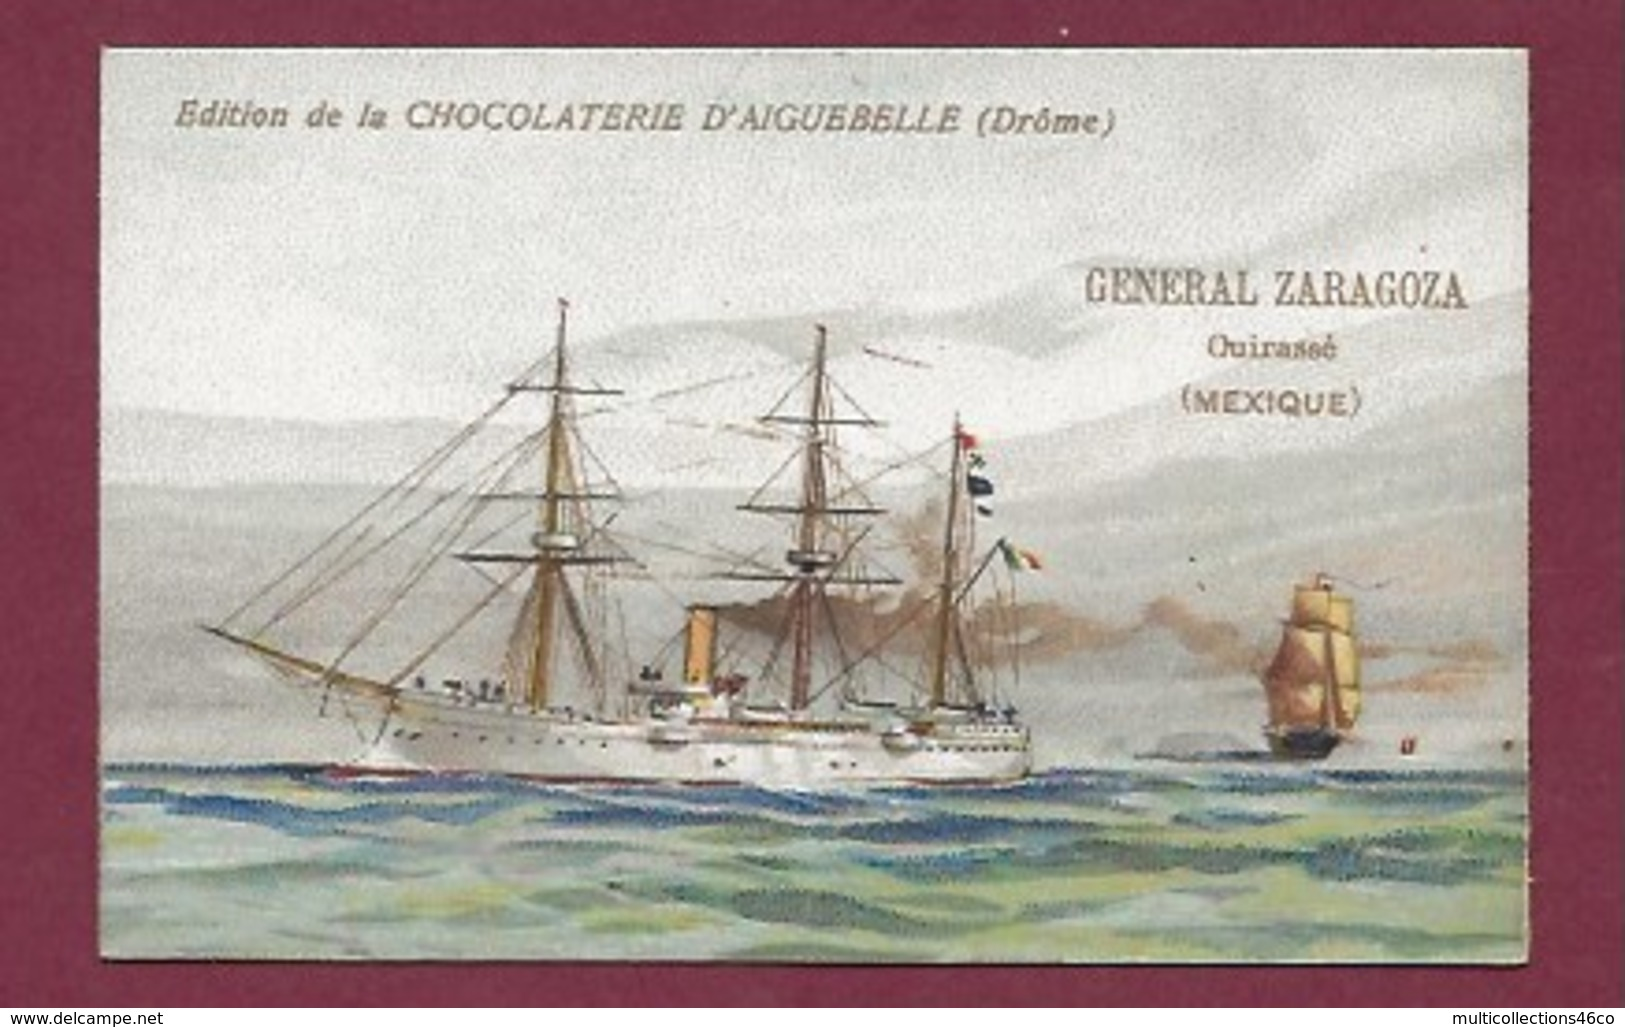 250619A - CHROMO CHOCOLAT AIGUEBELLE - GENERAL ZARAGOZA Mexique Cuirassé Construit Au Havre En 1891 - Aiguebelle